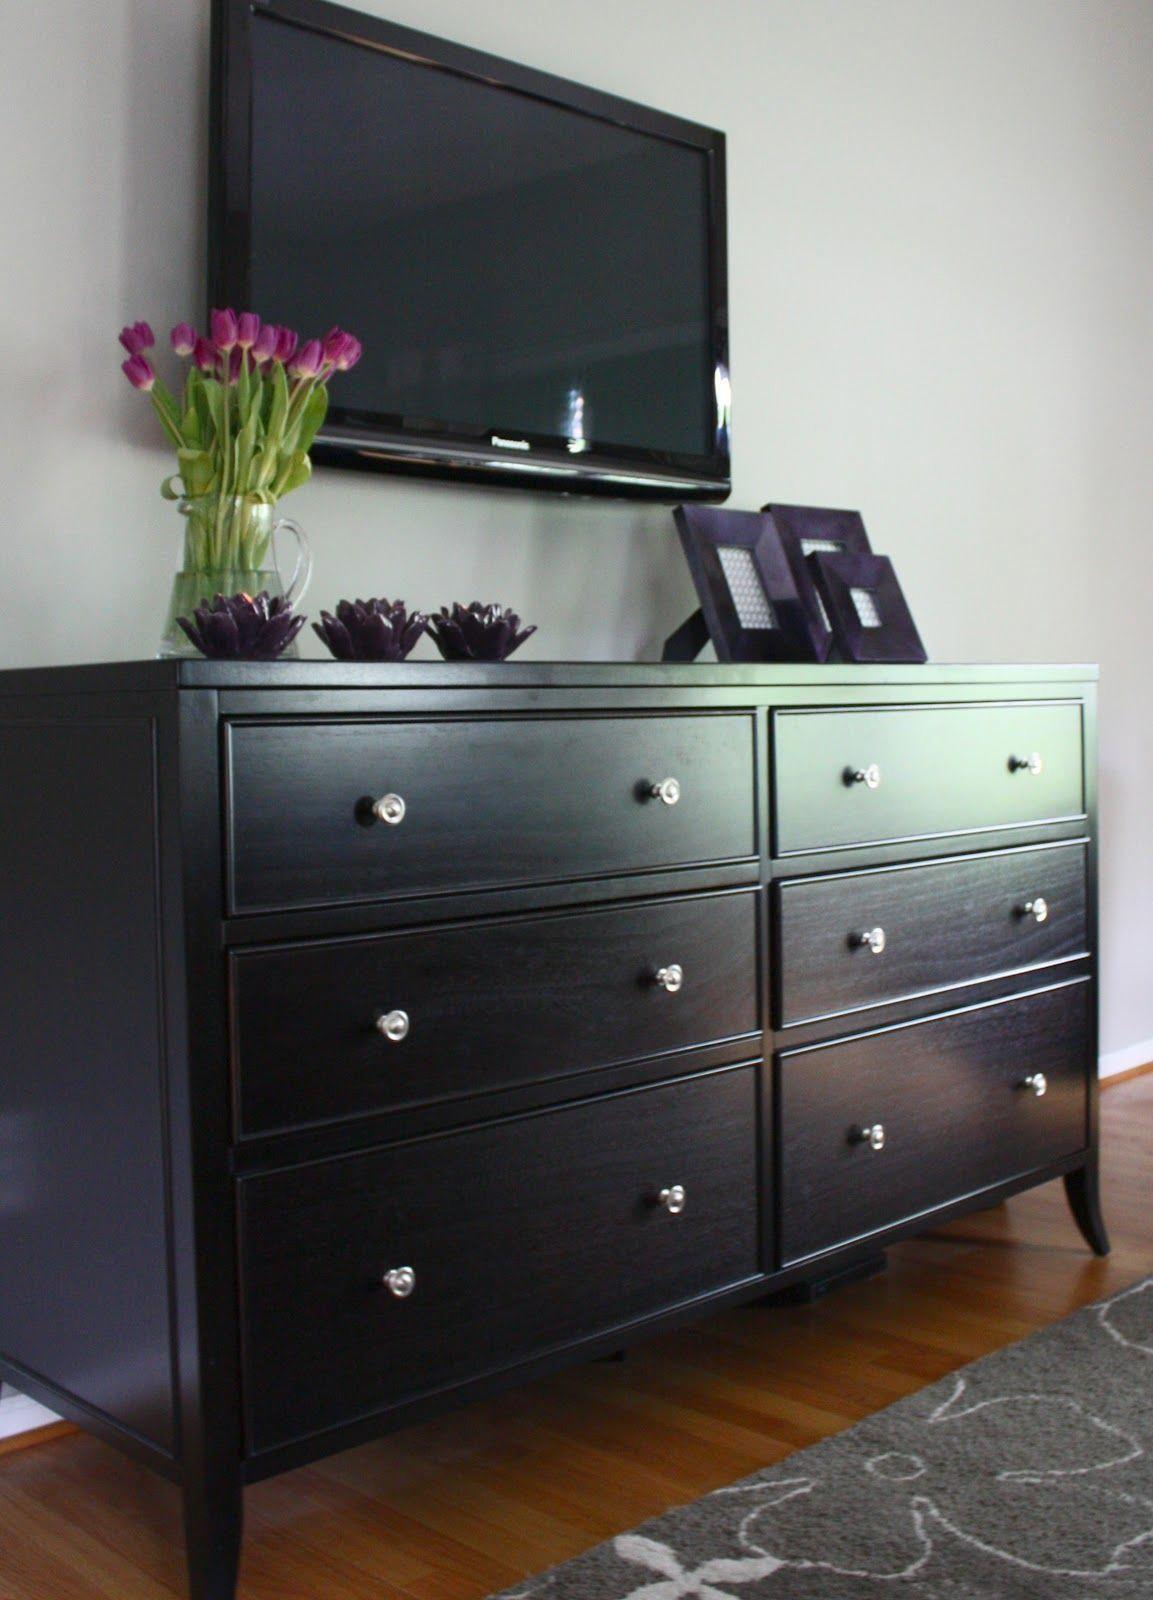 How To Clean Rooms Go Furniture Weddingringrosegold